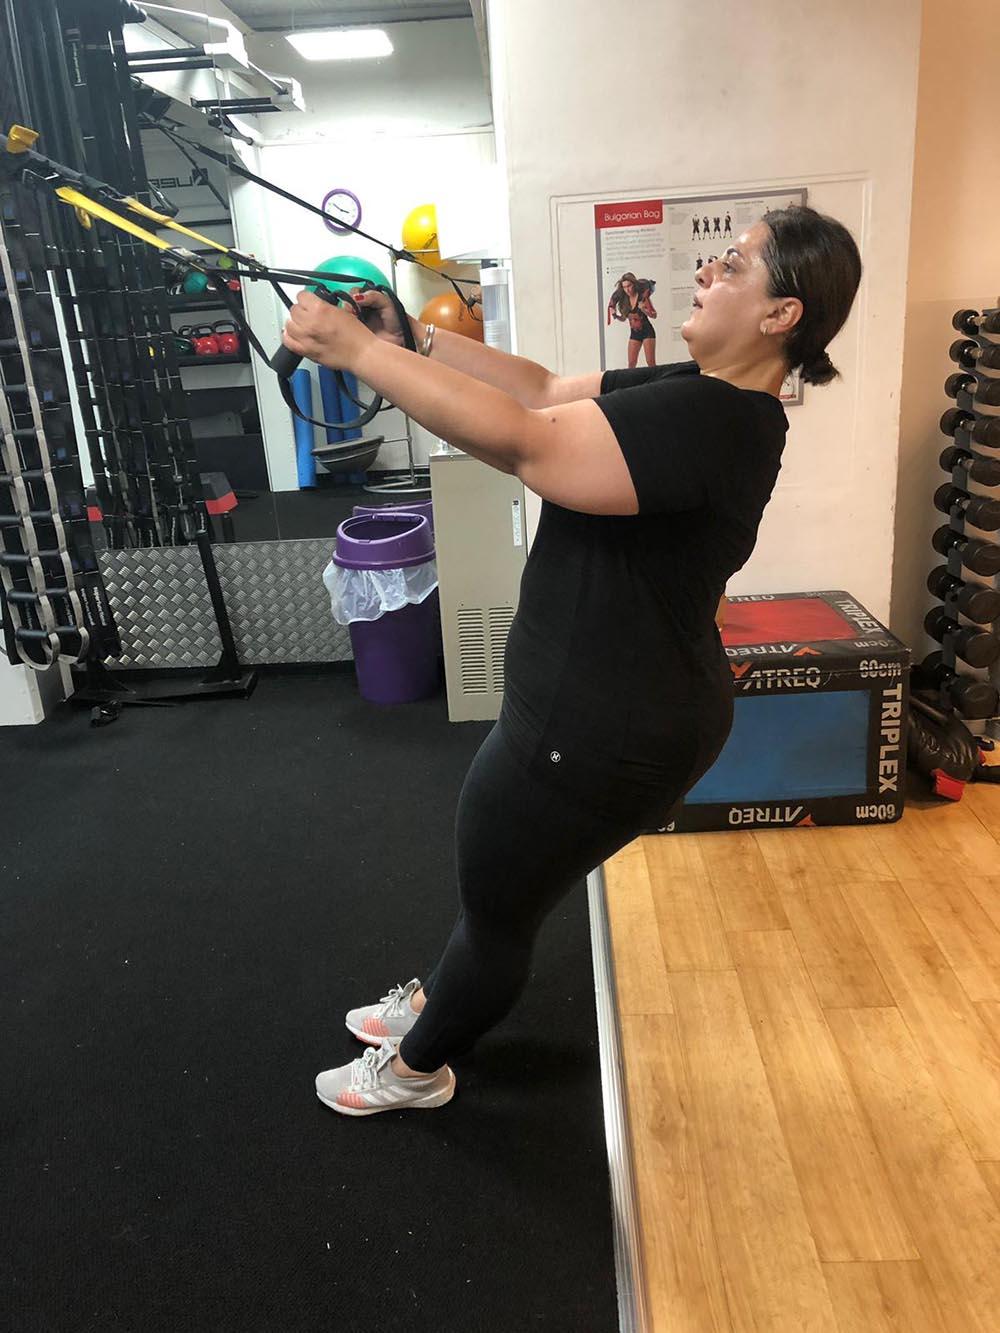 dina workout weight-loss transformation